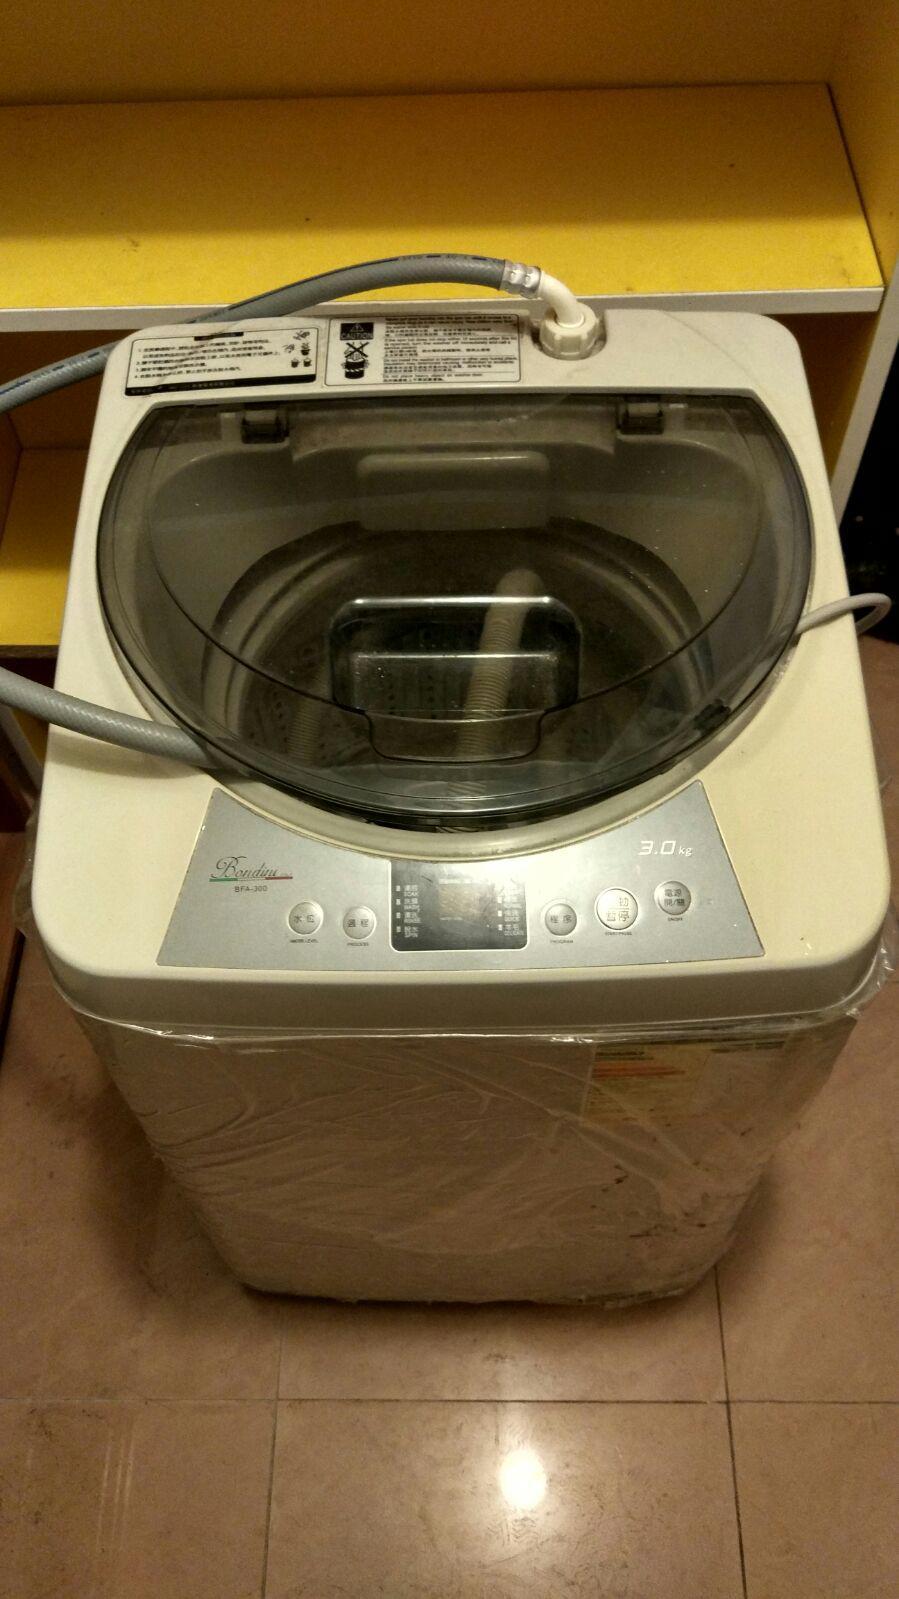 Ihram Kids For Sale Dubai: Ikea Book Shelf And Bondini Washing Machine For Sale